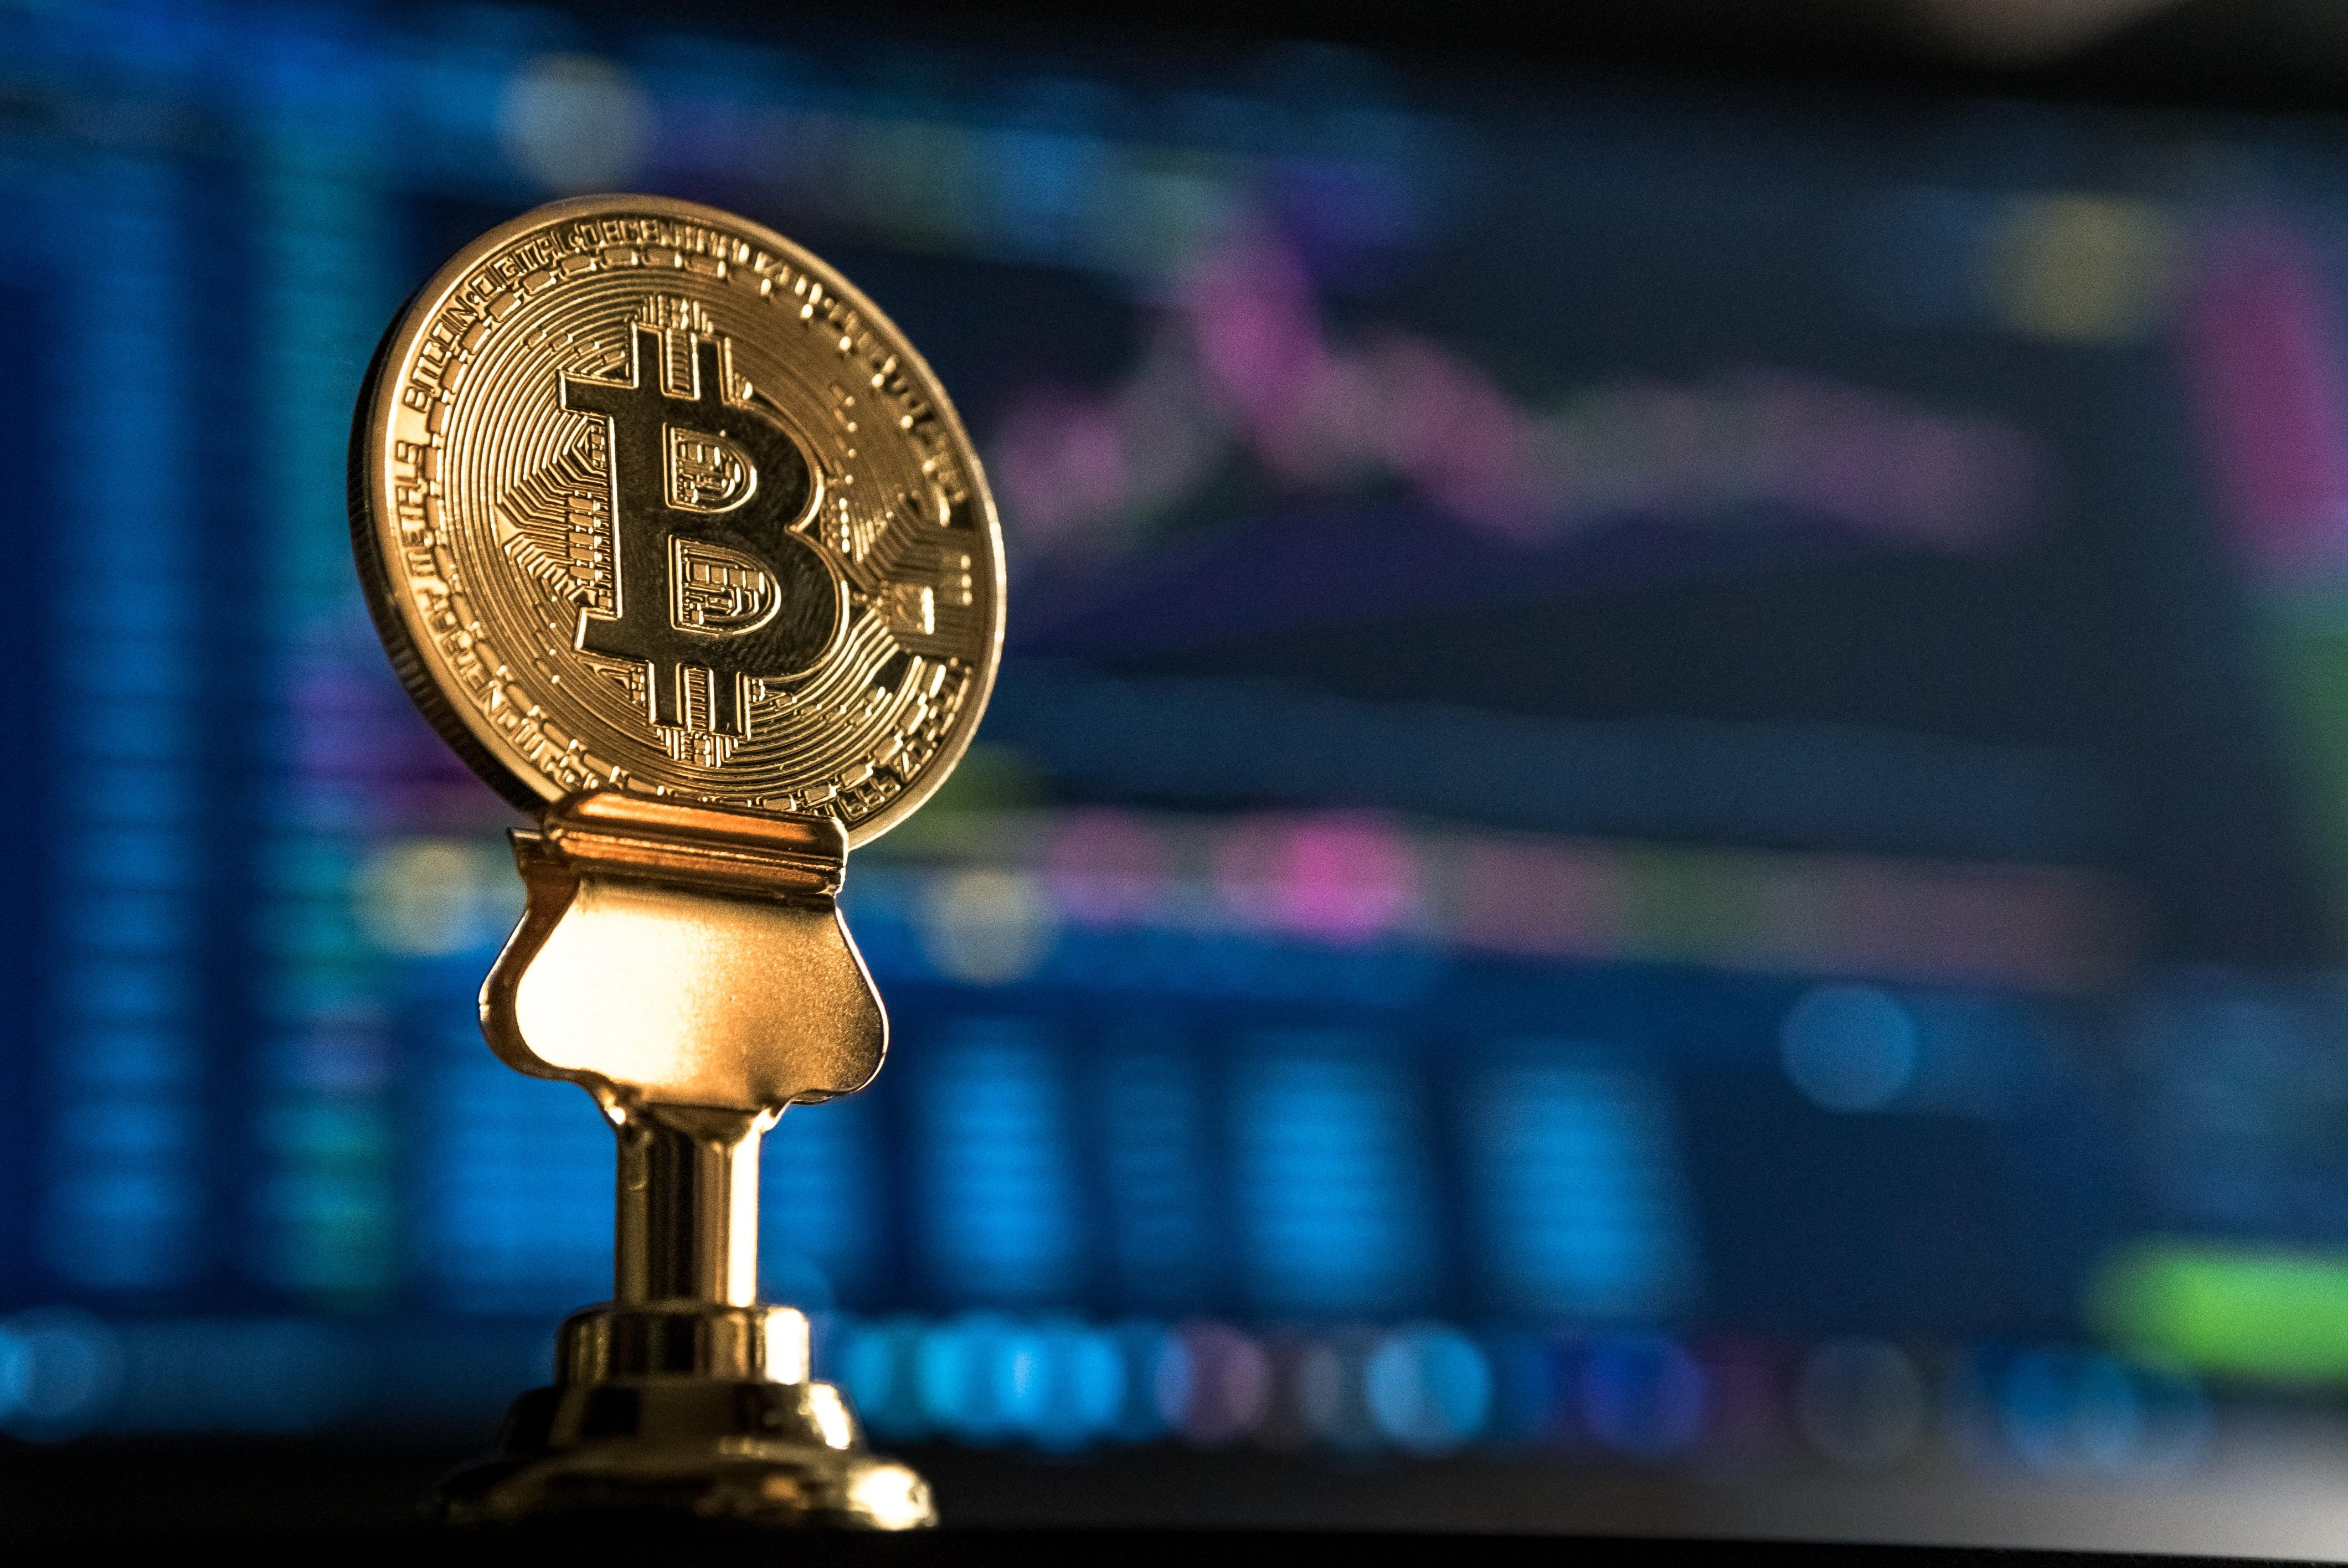 obținând prețul bitcoinilor